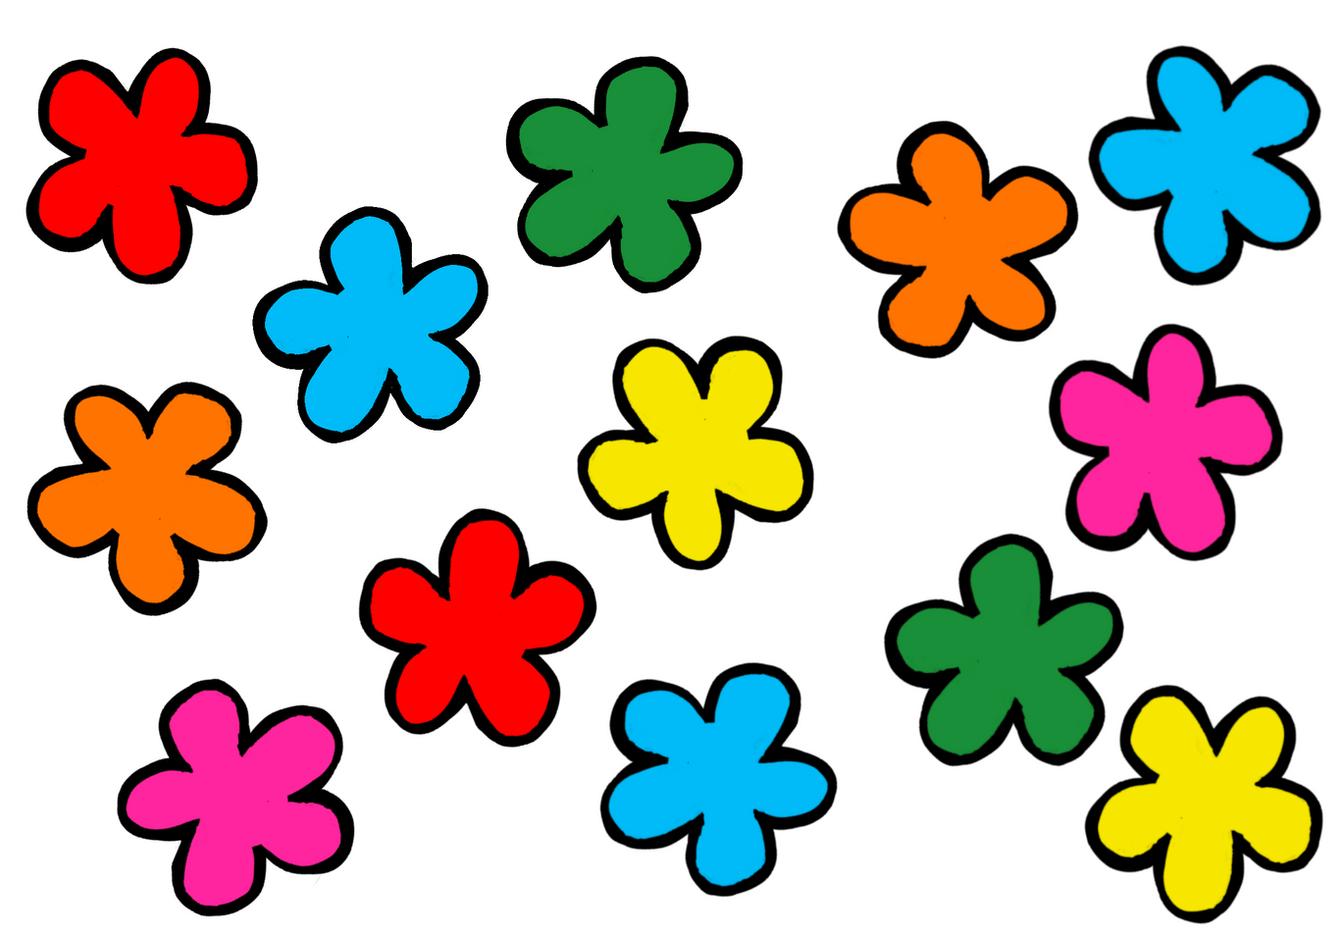 coloredFlowersBack.png